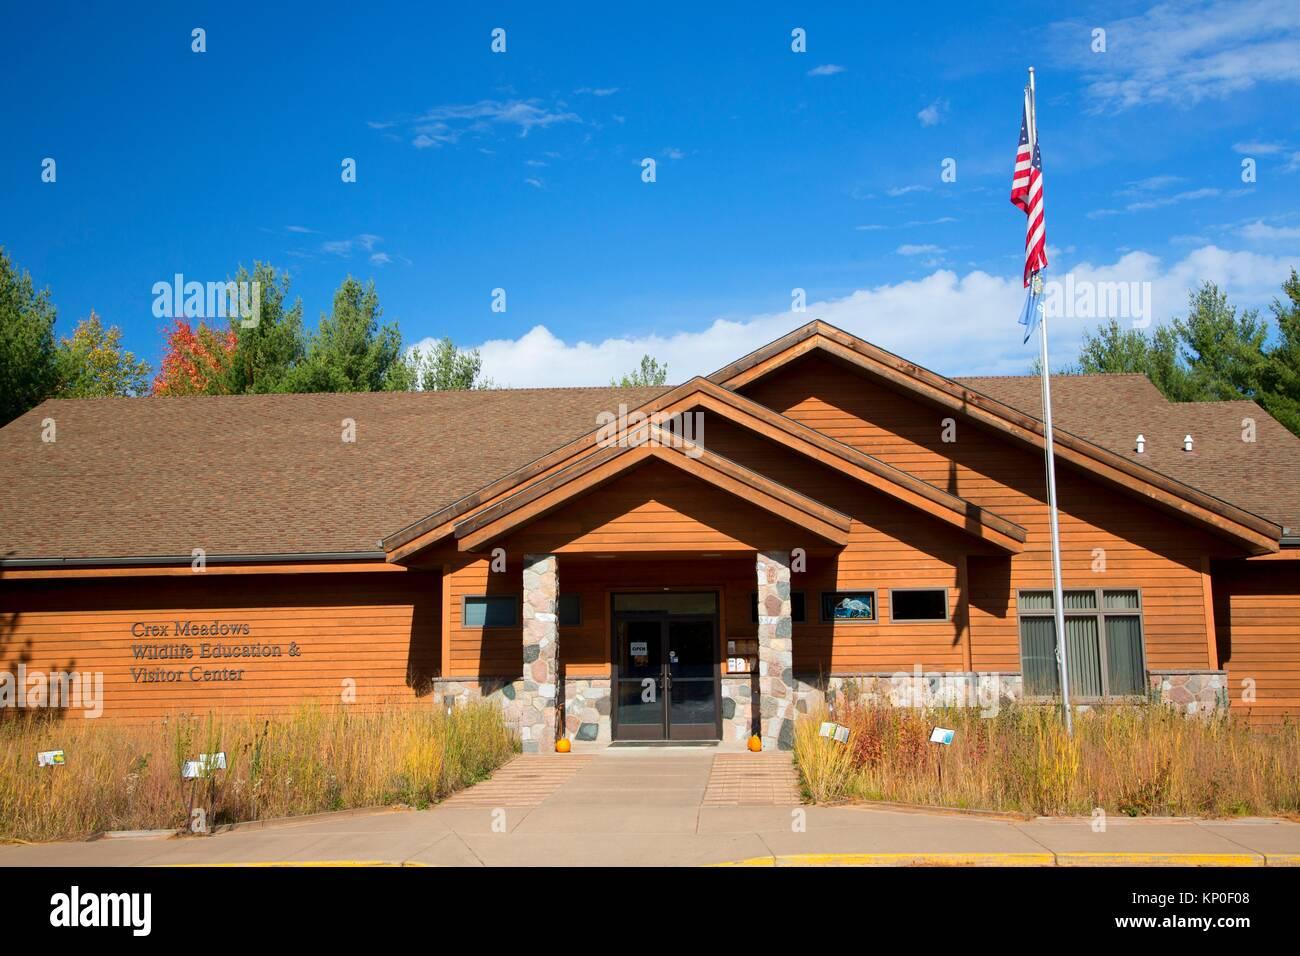 Visitor Center, Crex Meadows Wildlife Area, Wisconsin. - Stock Image